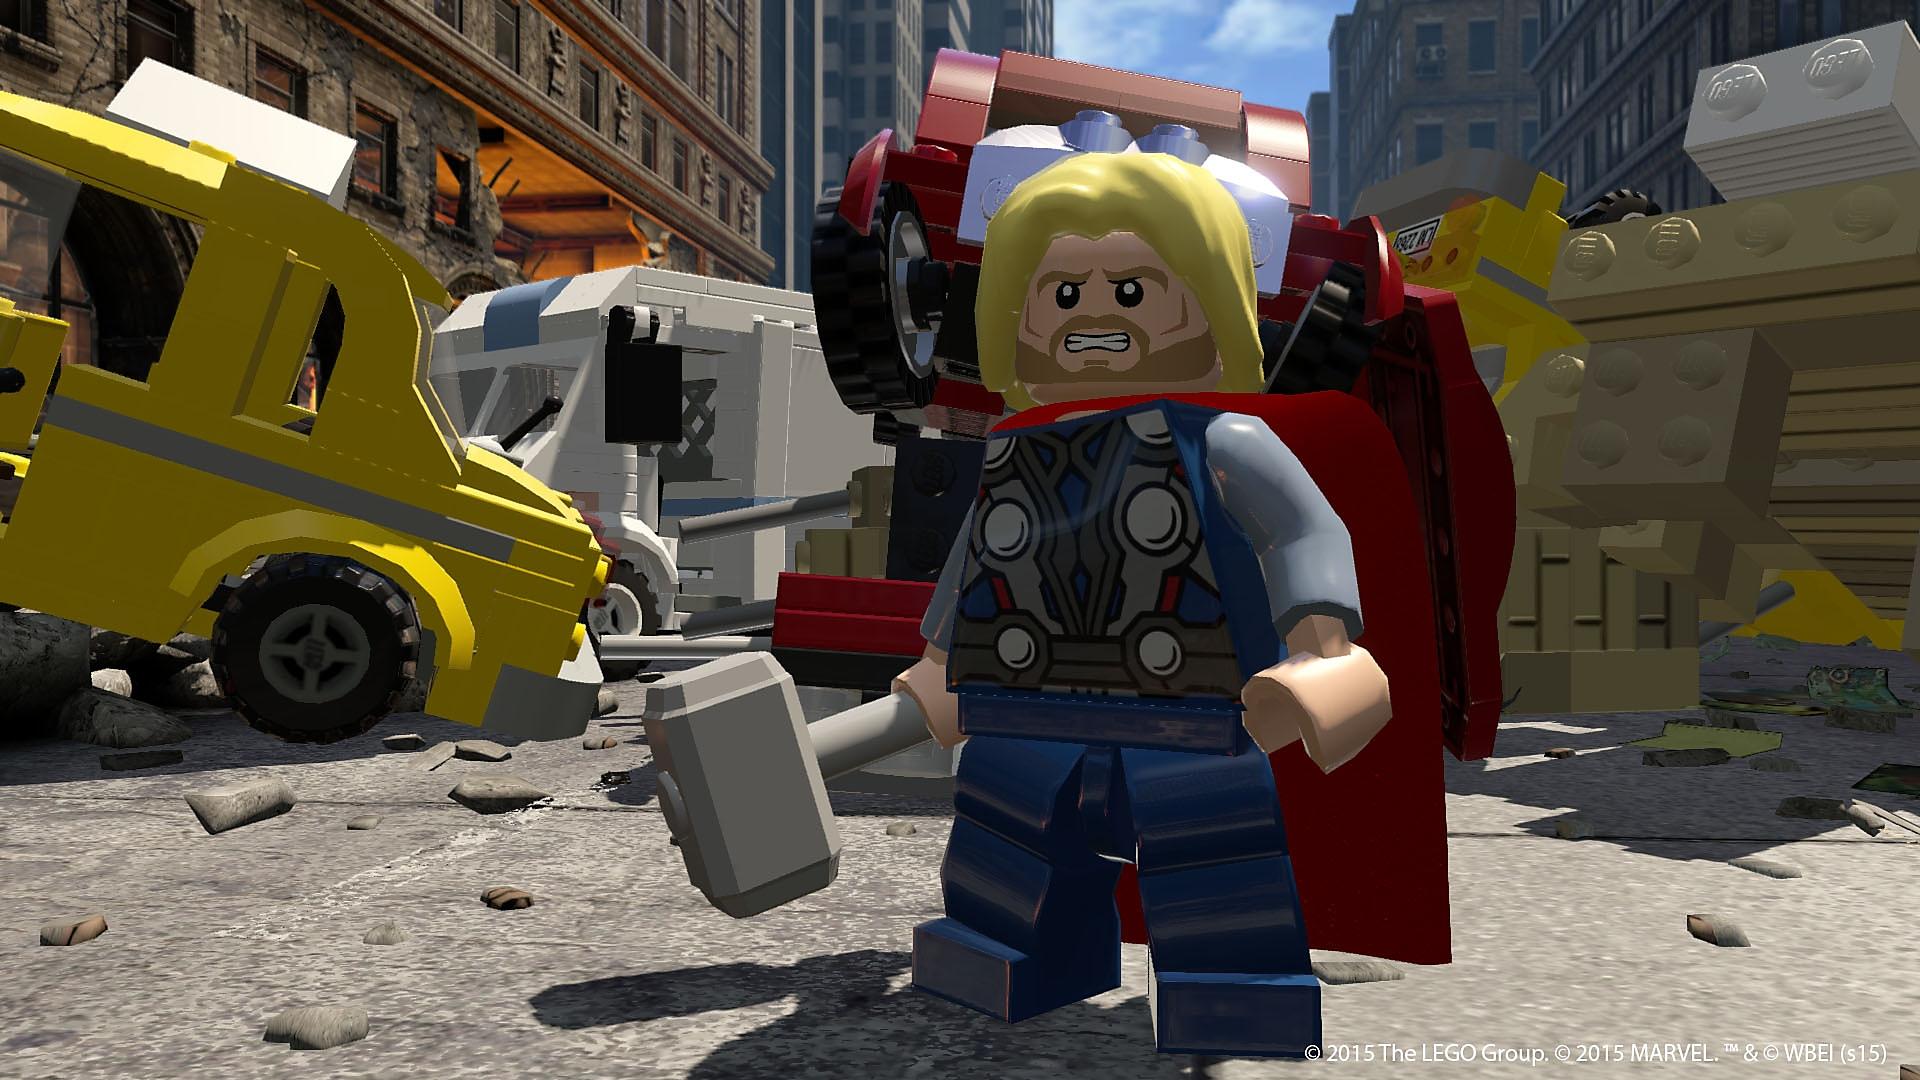 LEGO マーベル アベンジャーズ - Gallery Screenshot 4